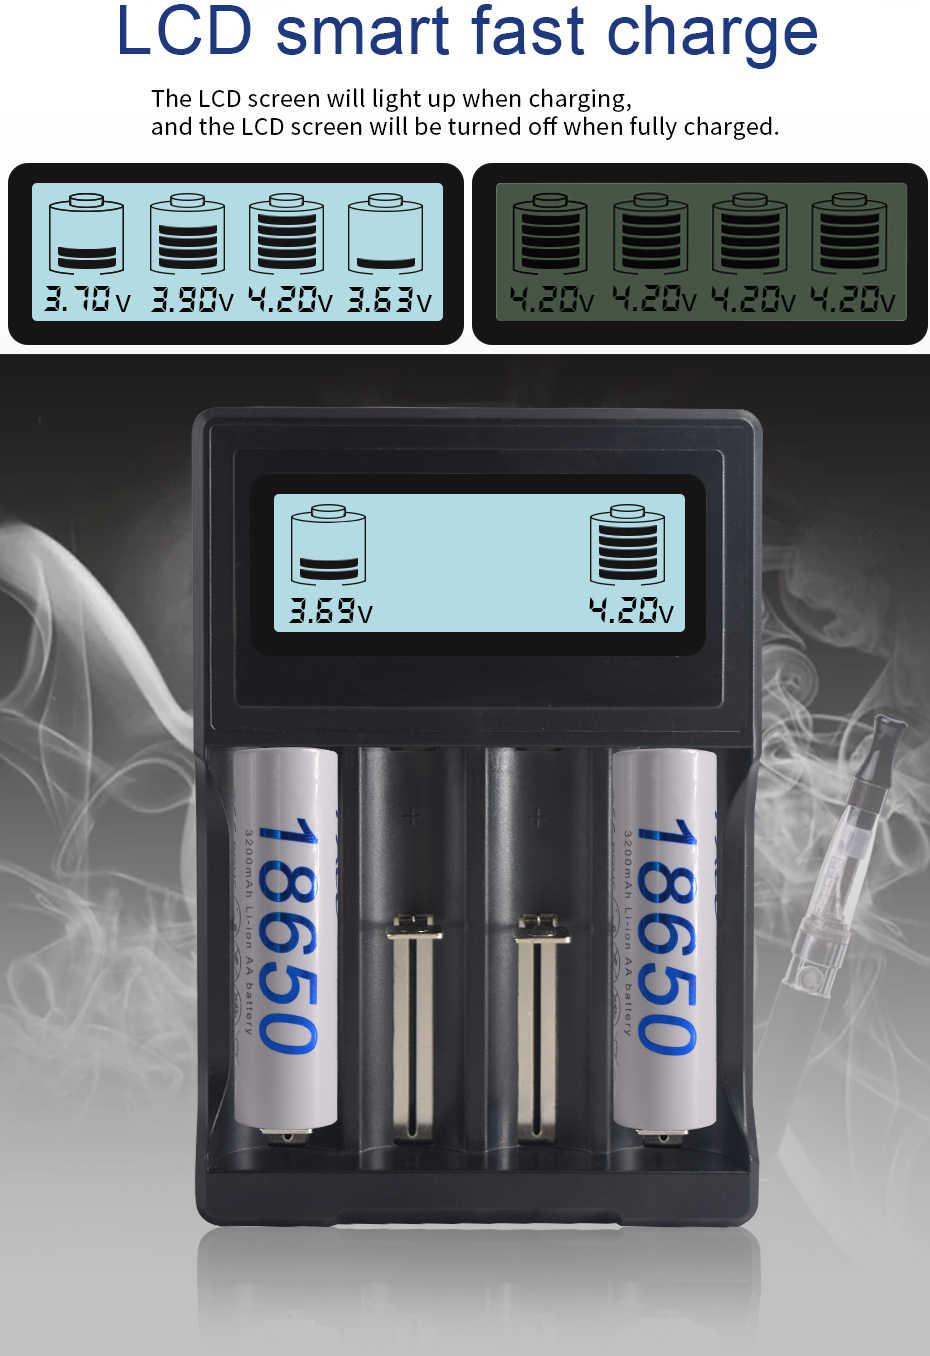 PALO شاشة الكريستال السائل الذكية 18650 شاحن ل 3.7 فولت 18650 18350 18500 16340 17500 25500 10440 14500 26650 شاحن بطارية ليثيوم